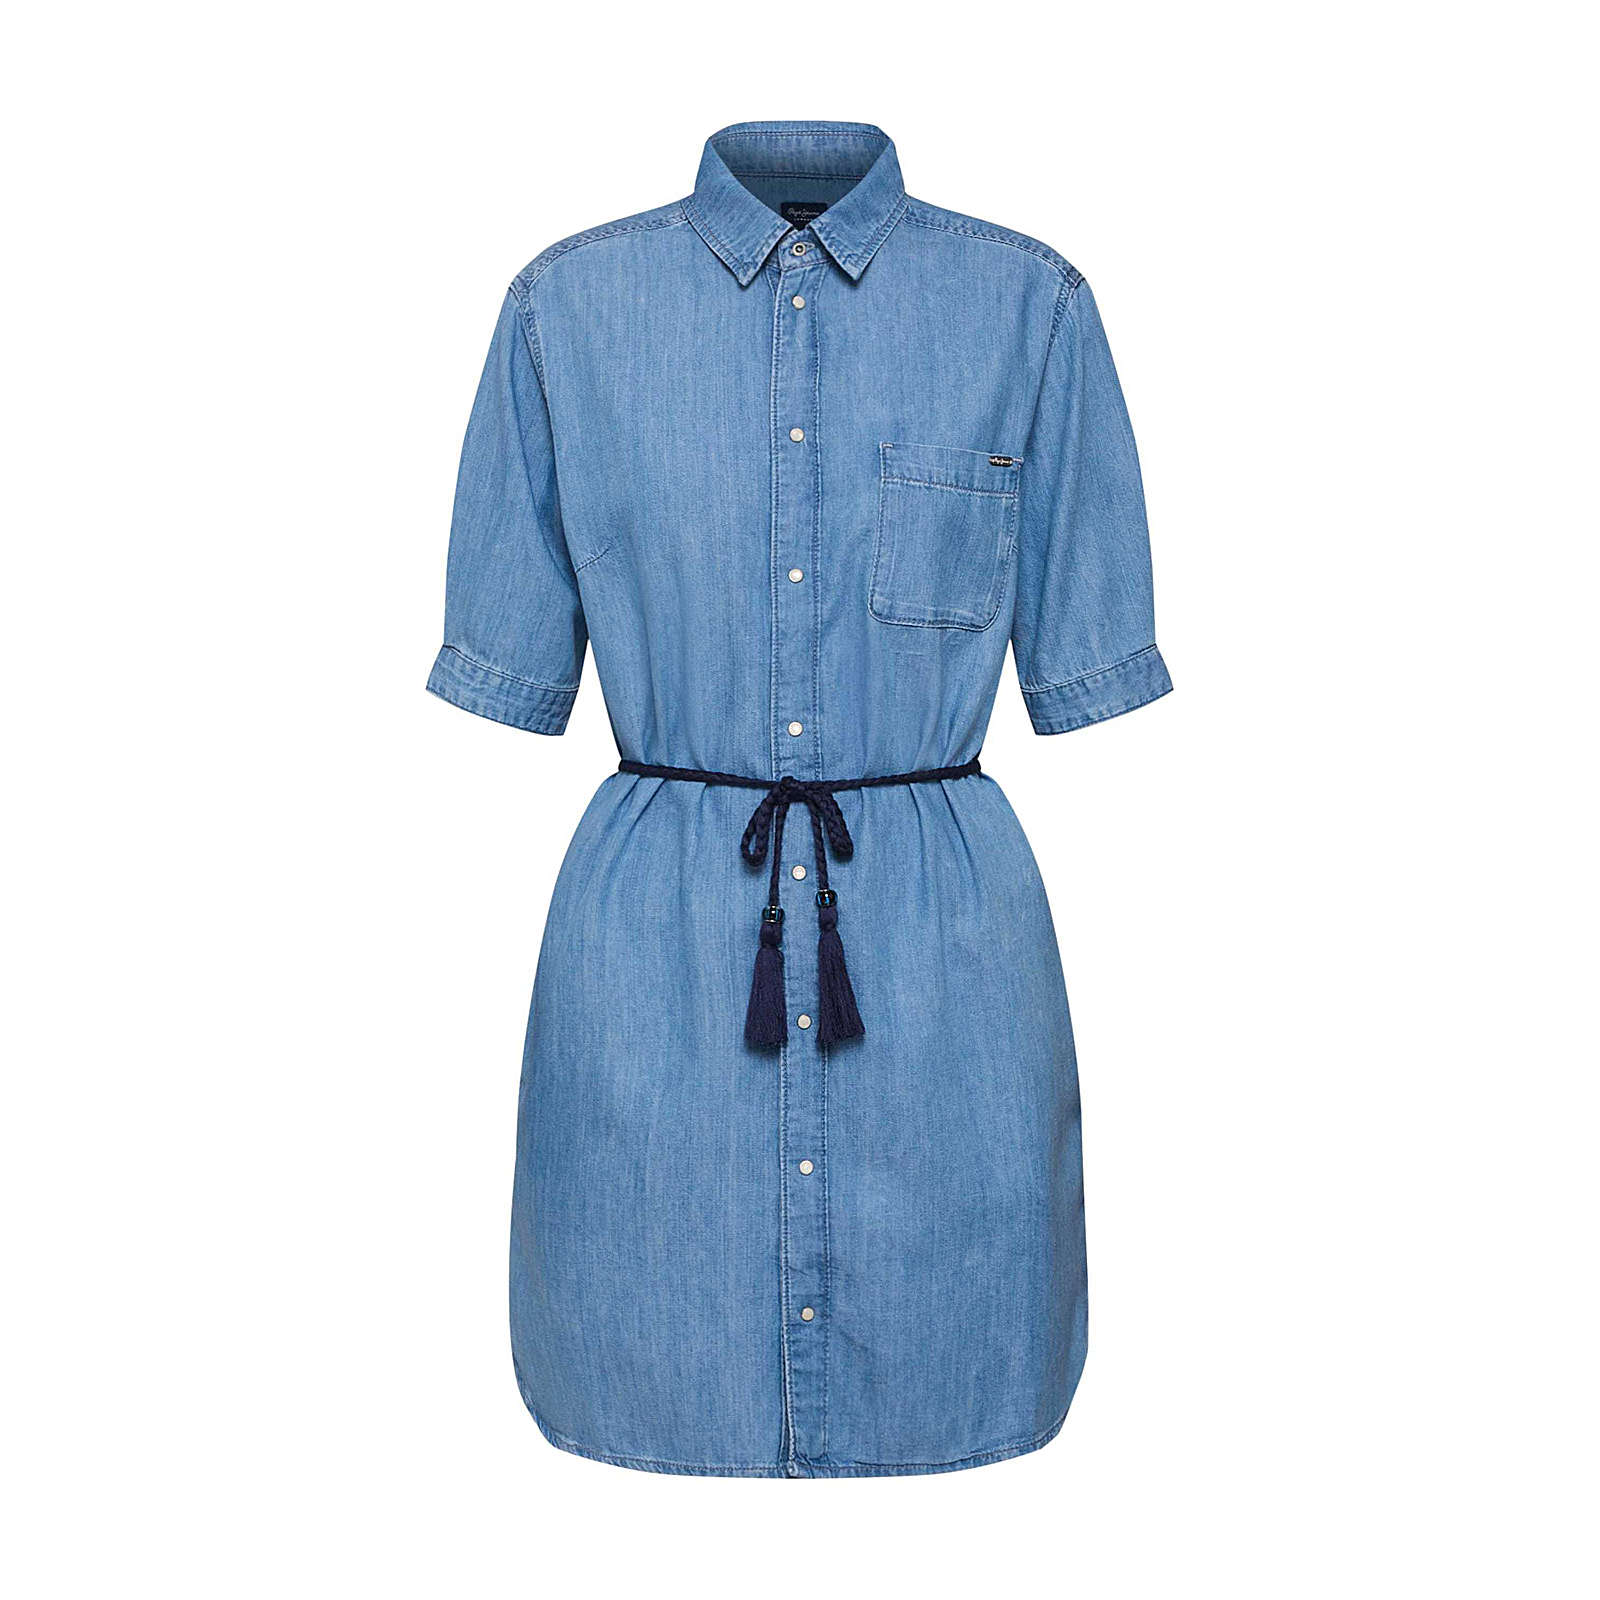 Pepe Jeans Blusenkleid EVELYN Blusenkleider blau Damen Gr. 38